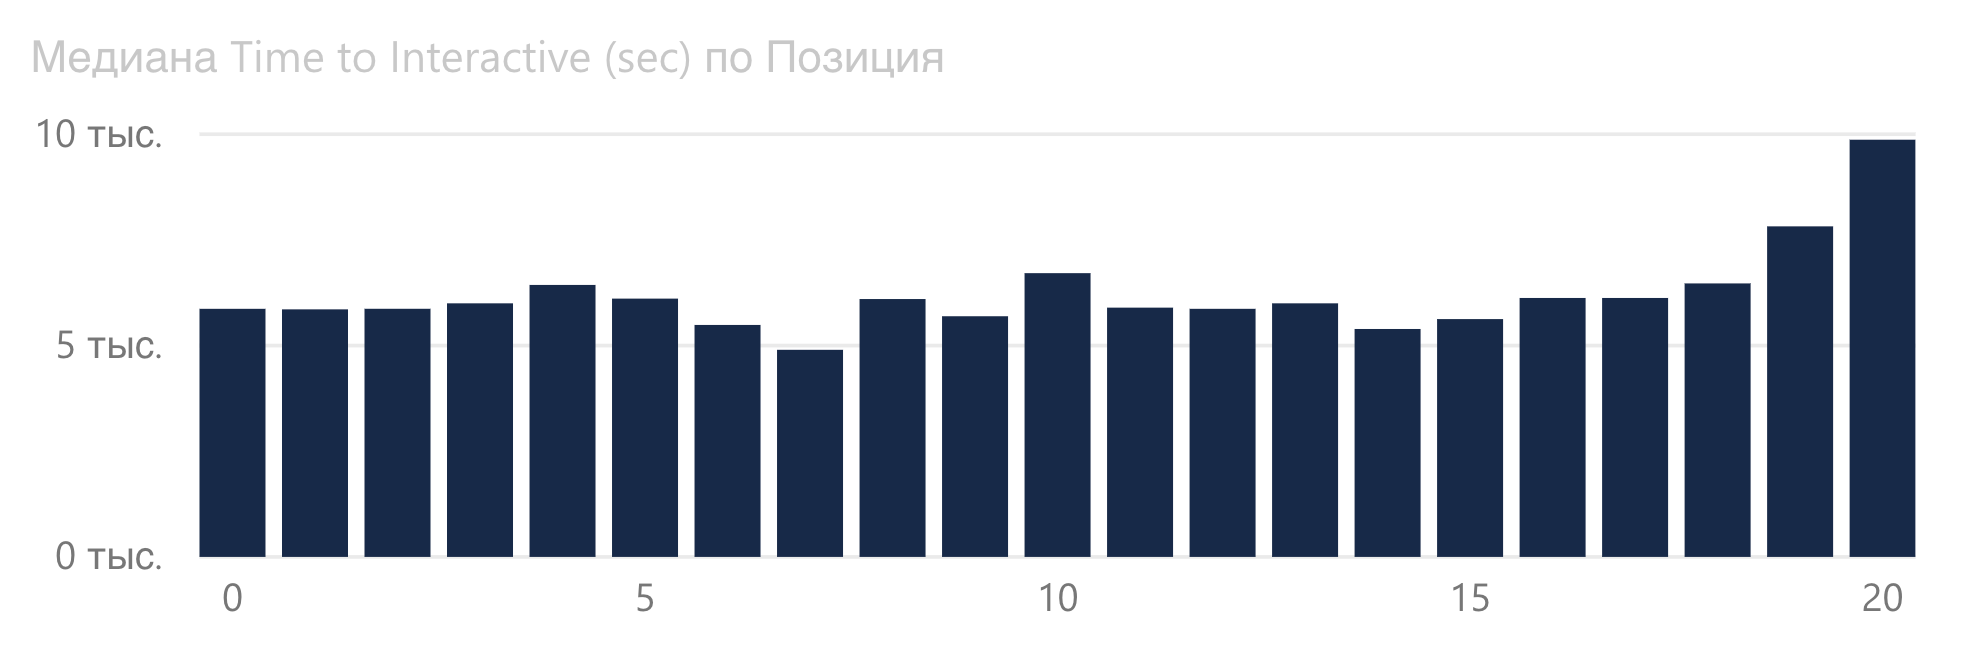 График зависимости Time to Interactive от позиции в Google.